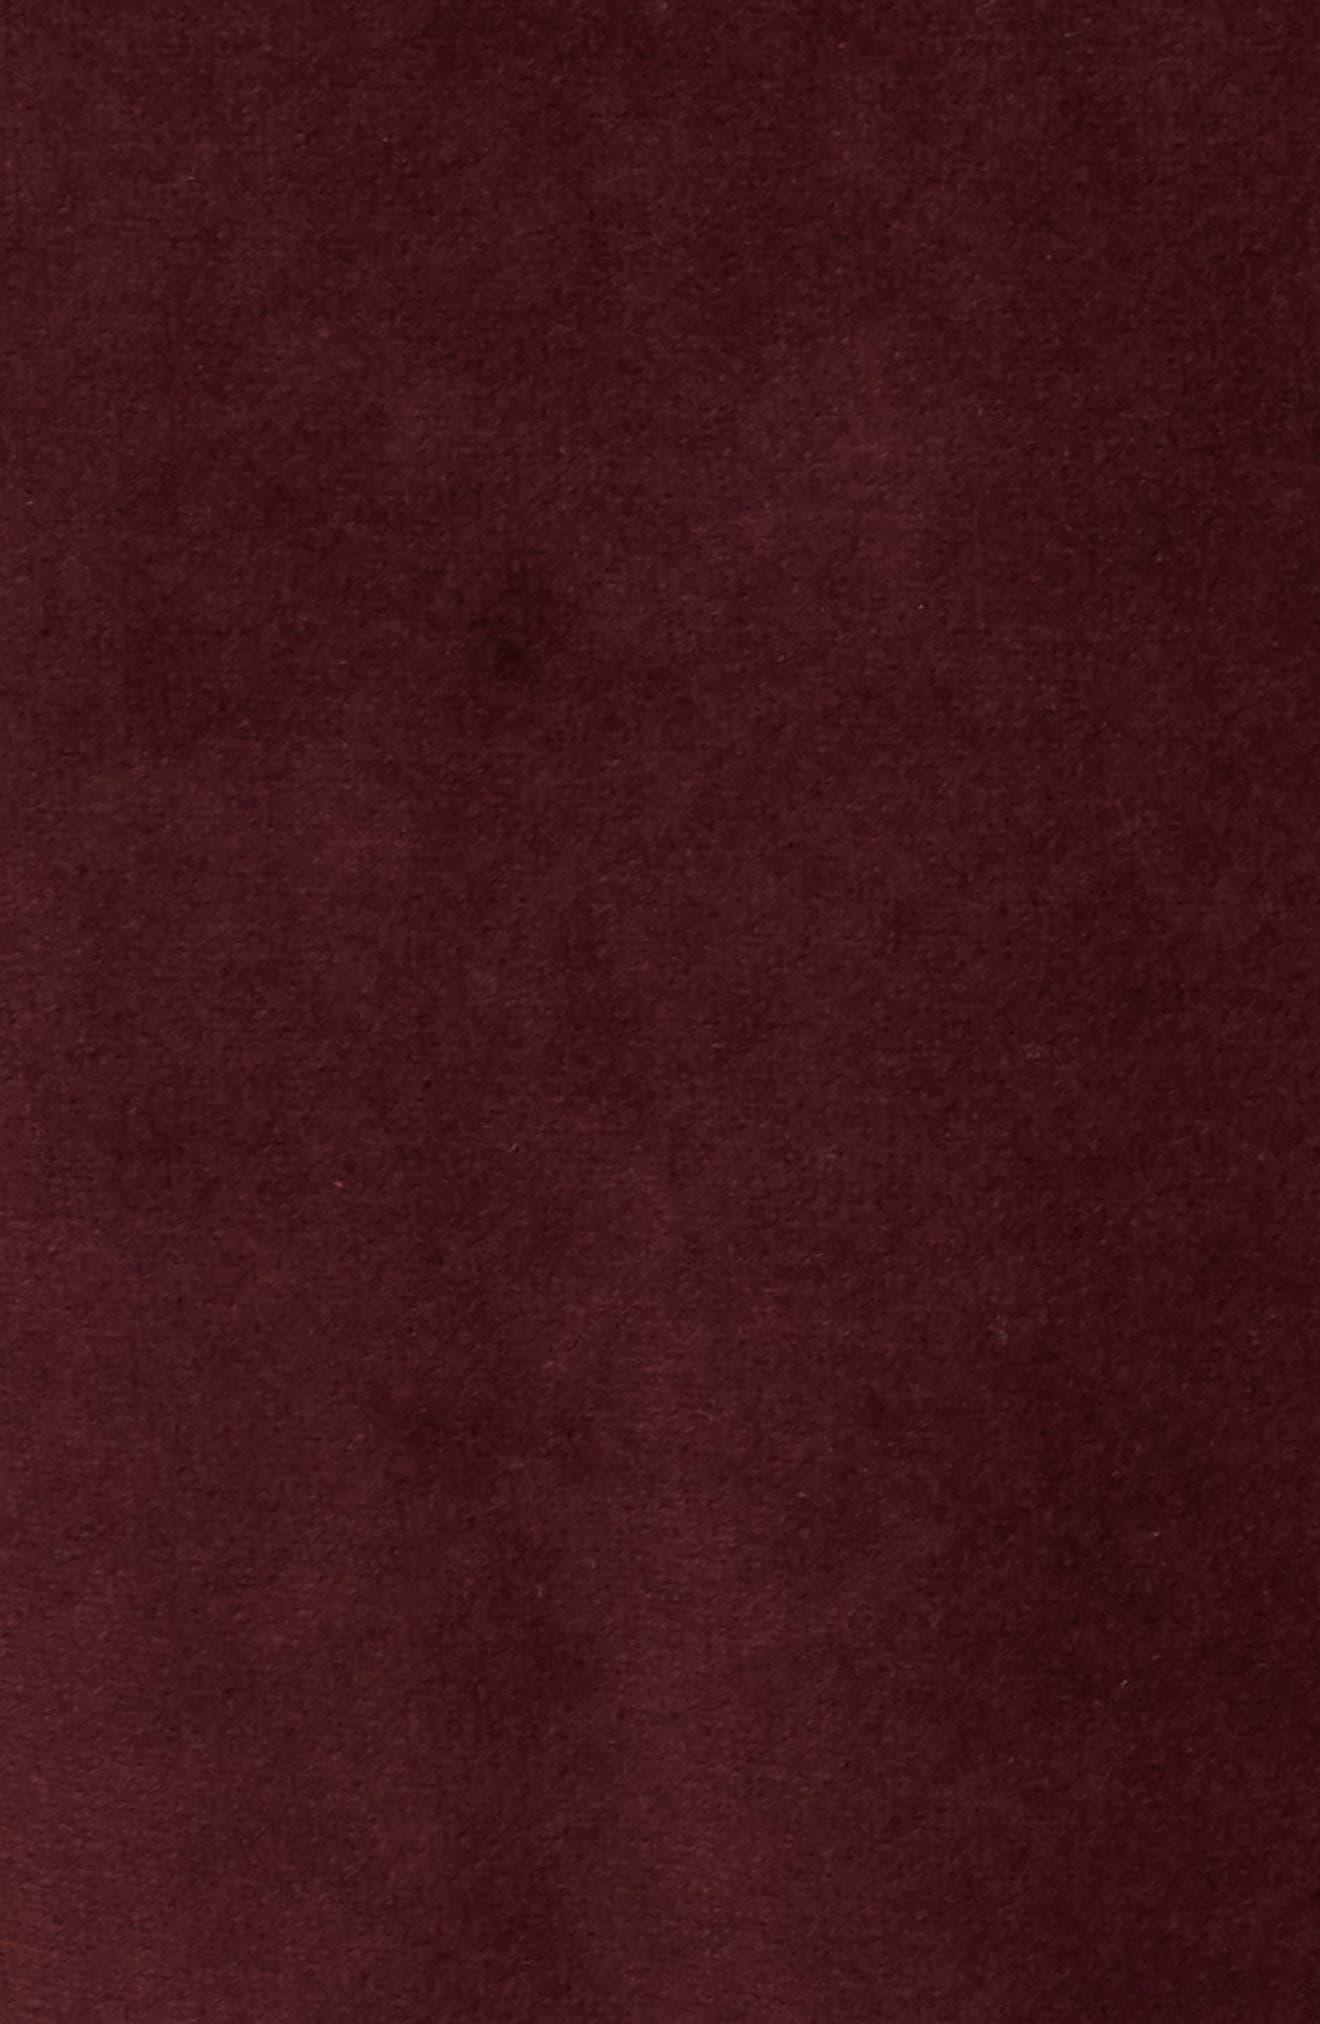 Velour Jogger Pants,                             Alternate thumbnail 5, color,                             601